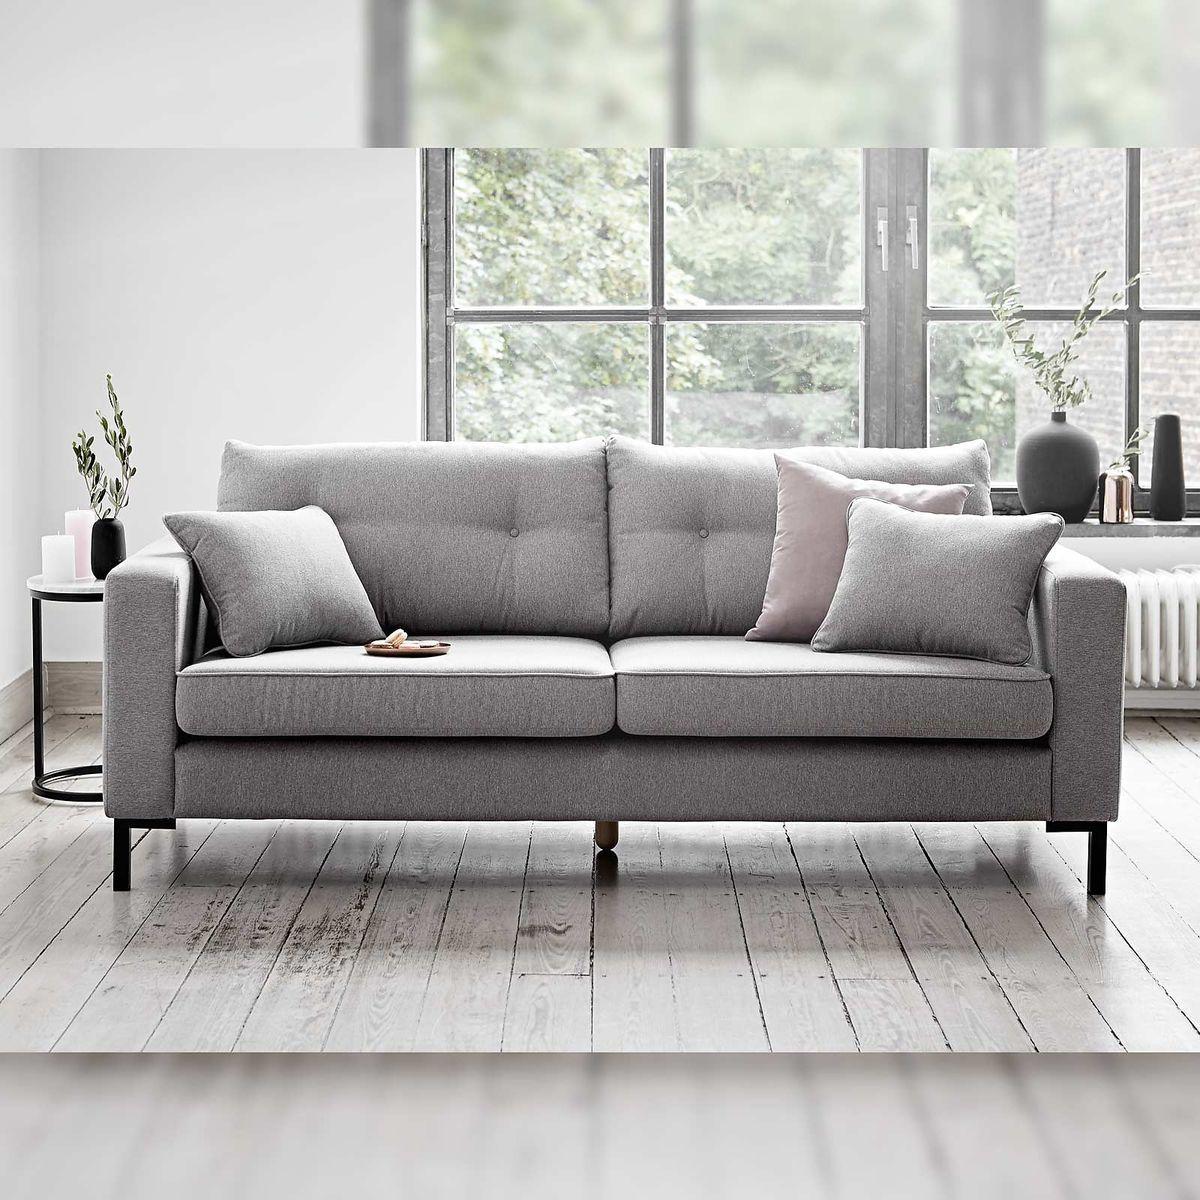 Sofa In Der Trendfarbe Grau 3er Sofa Graues Sofa Living Room Wohnzimmer